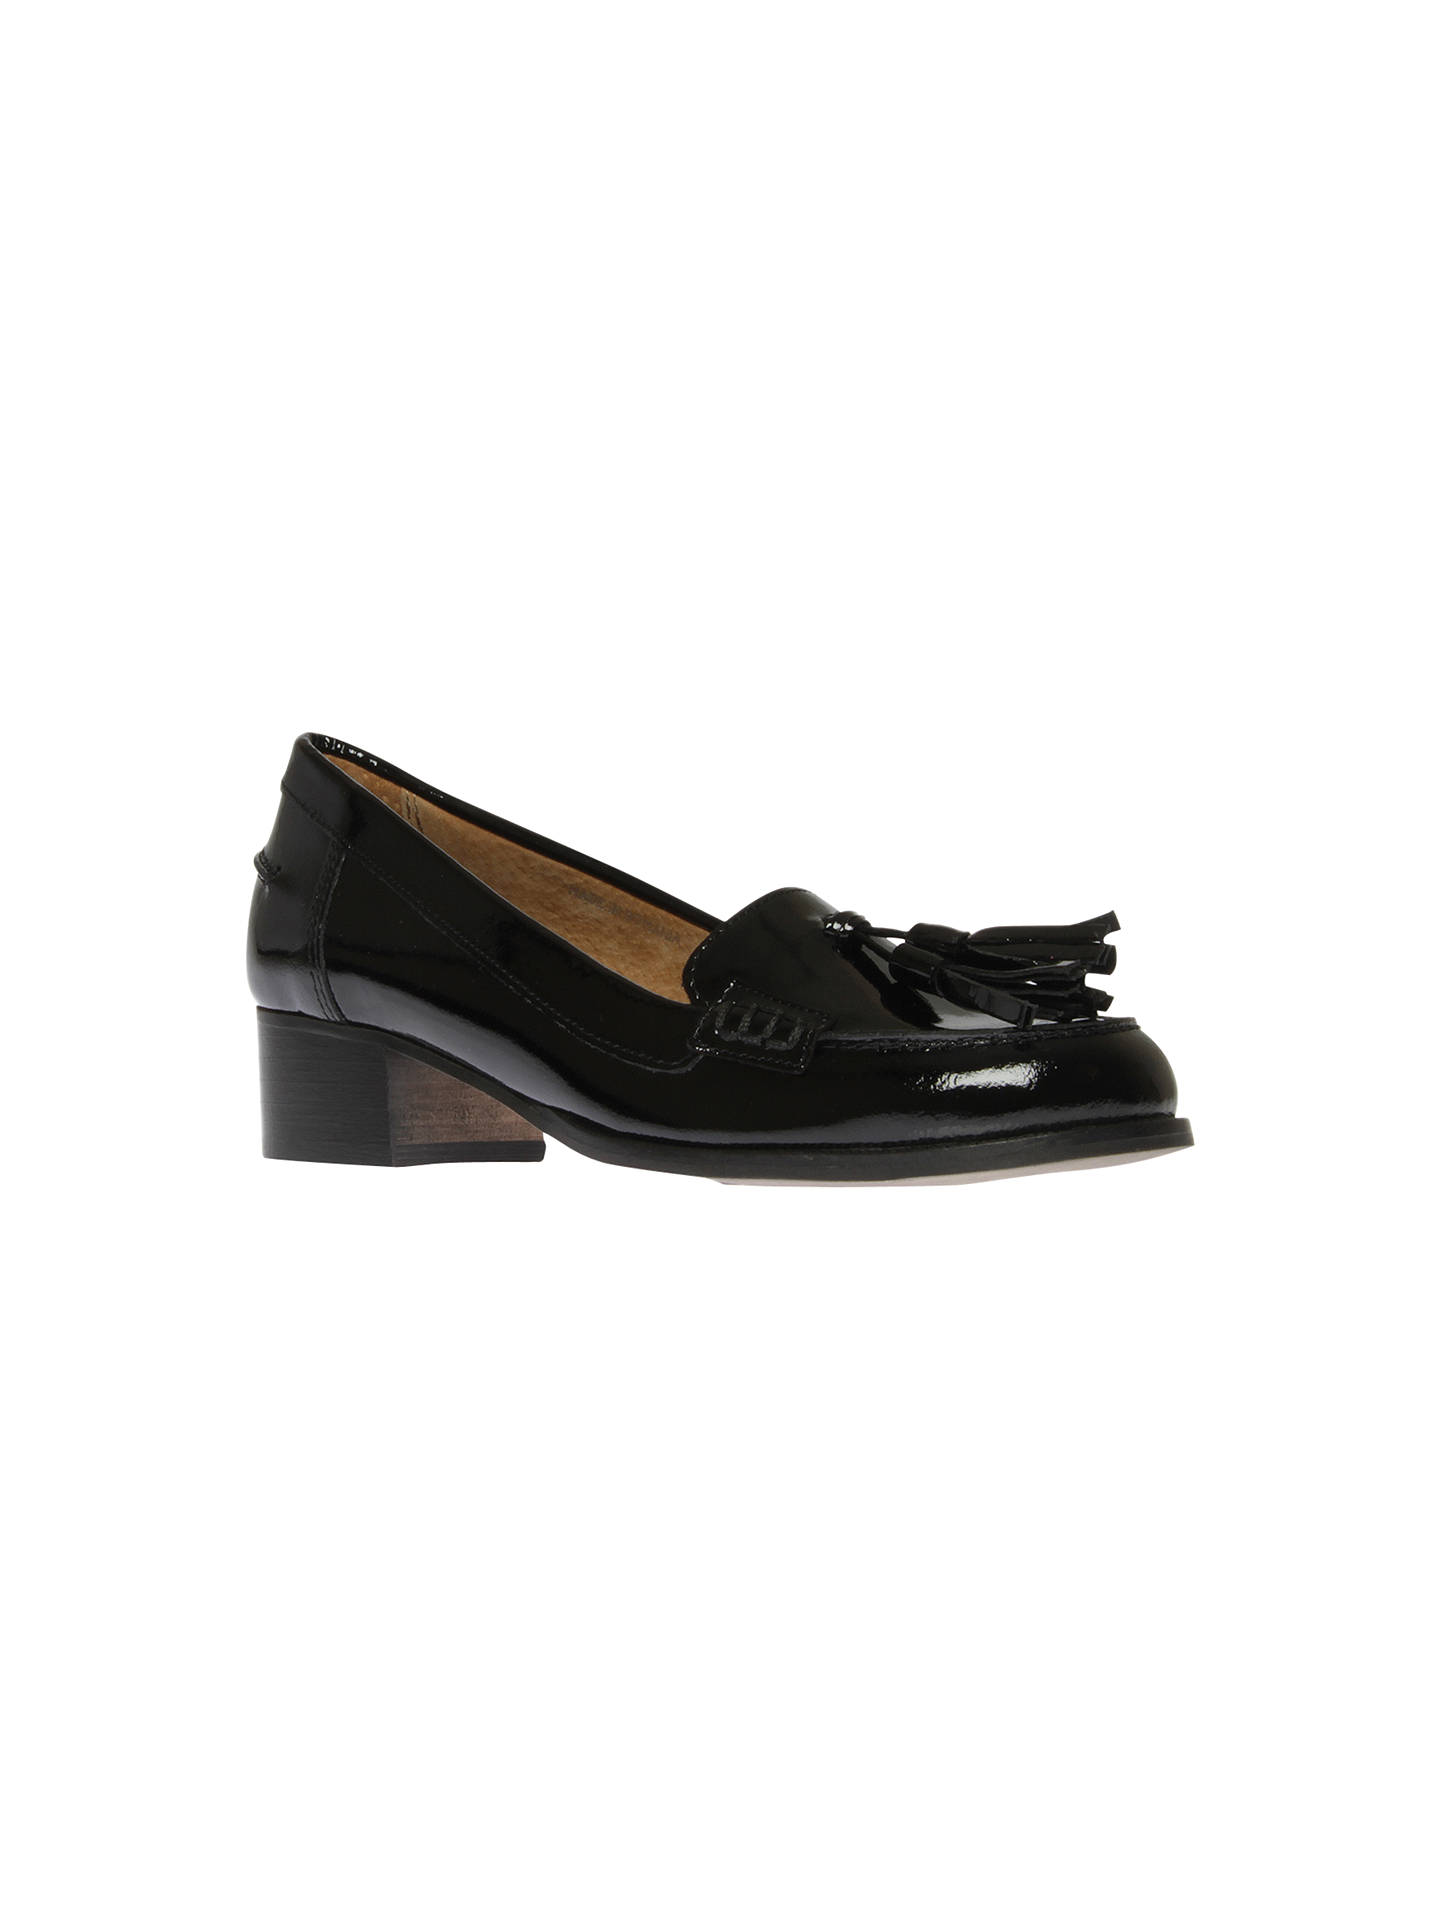 a38aec103e24 Buy Carvela Lexie Tassel Patent Leather Block Heel Loafers